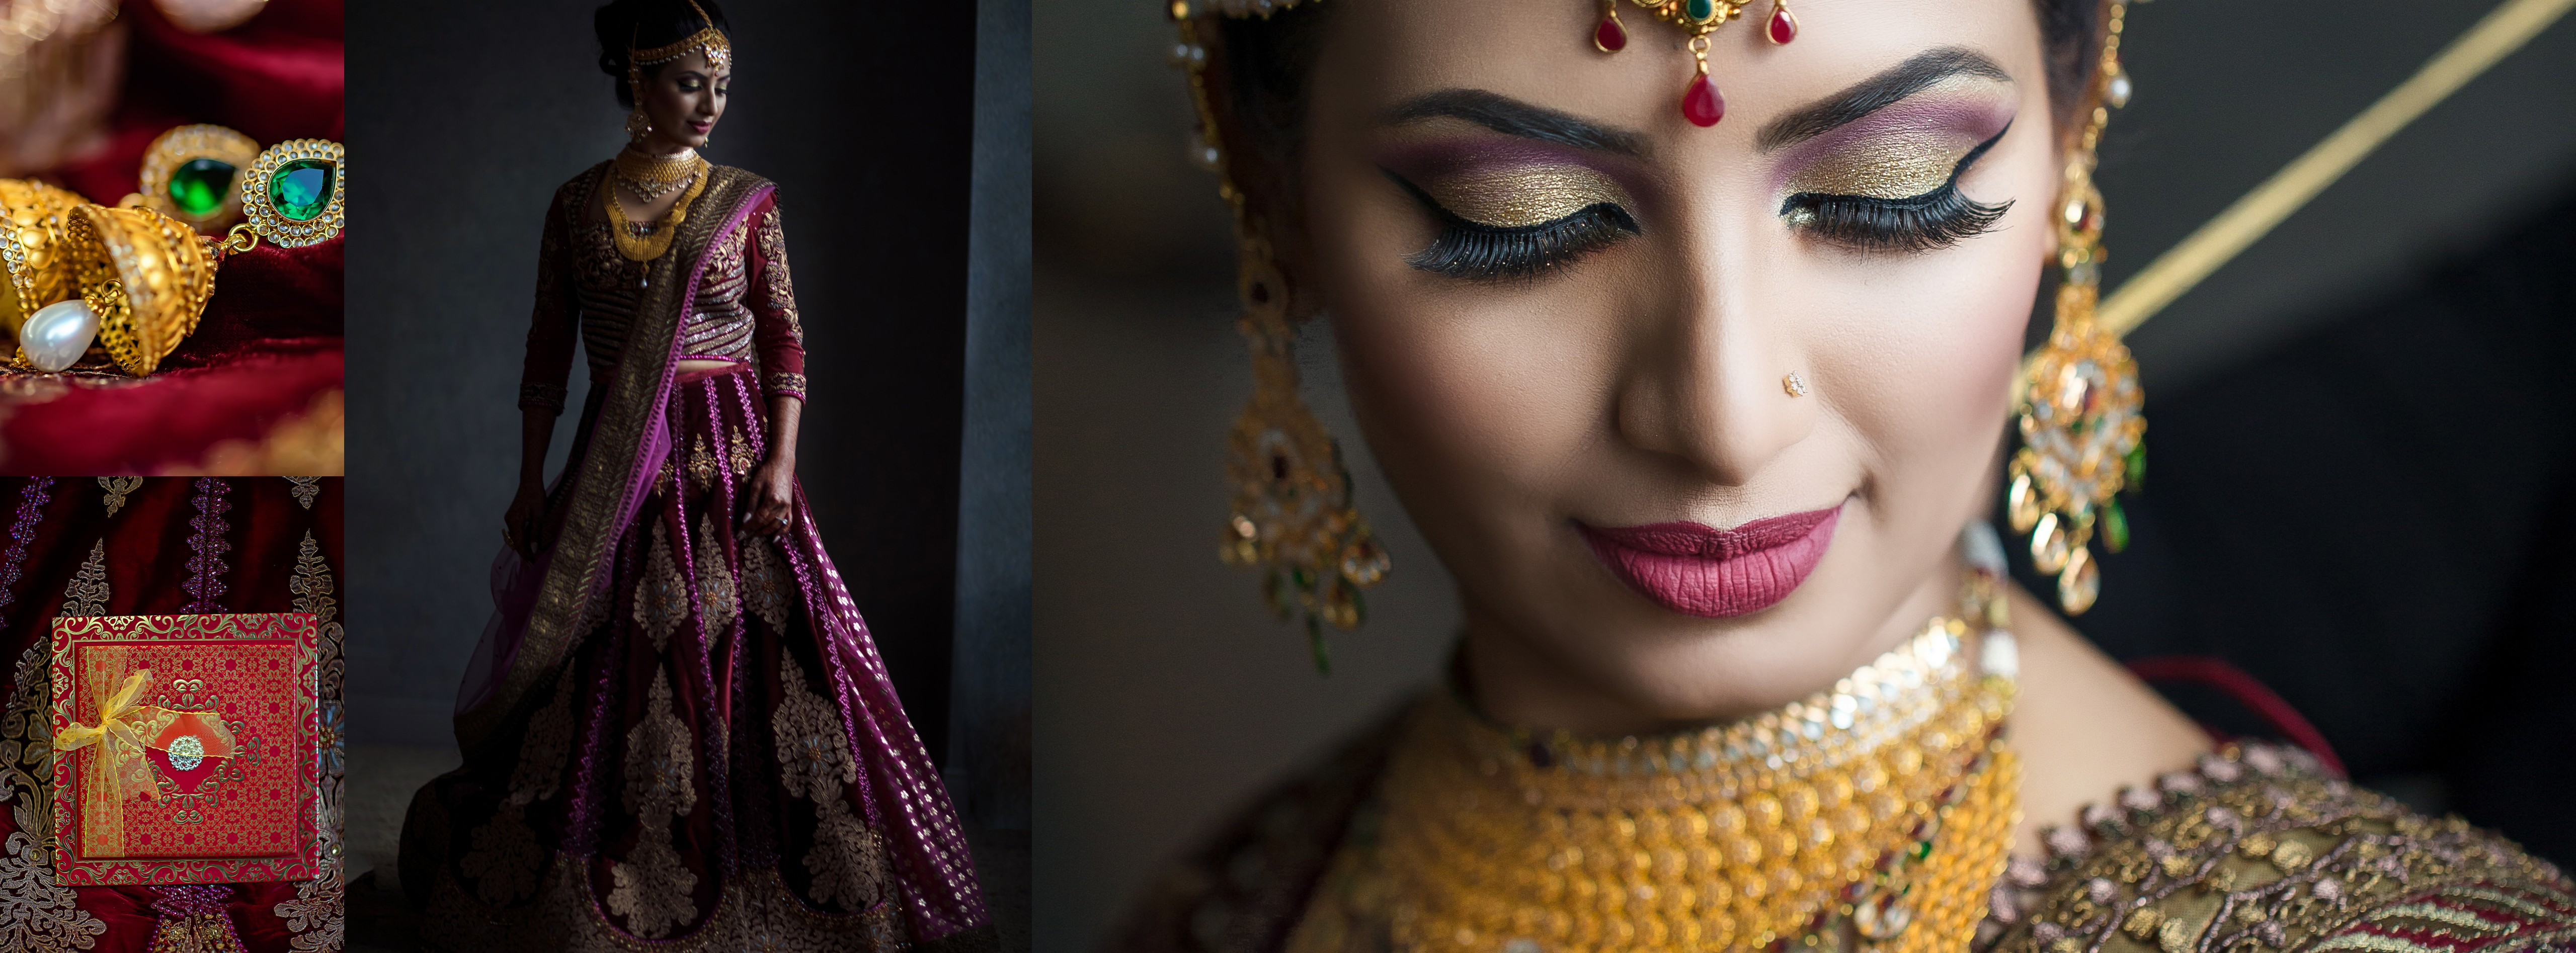 Muslim Weddings – Traditions, Customs, Bridal Dresses, Miami Wedding Photographers | Häring Photography, Indian Wedding Photographer in Florida, Best Muslim, Hindu - South East Asian Wedding Photographers